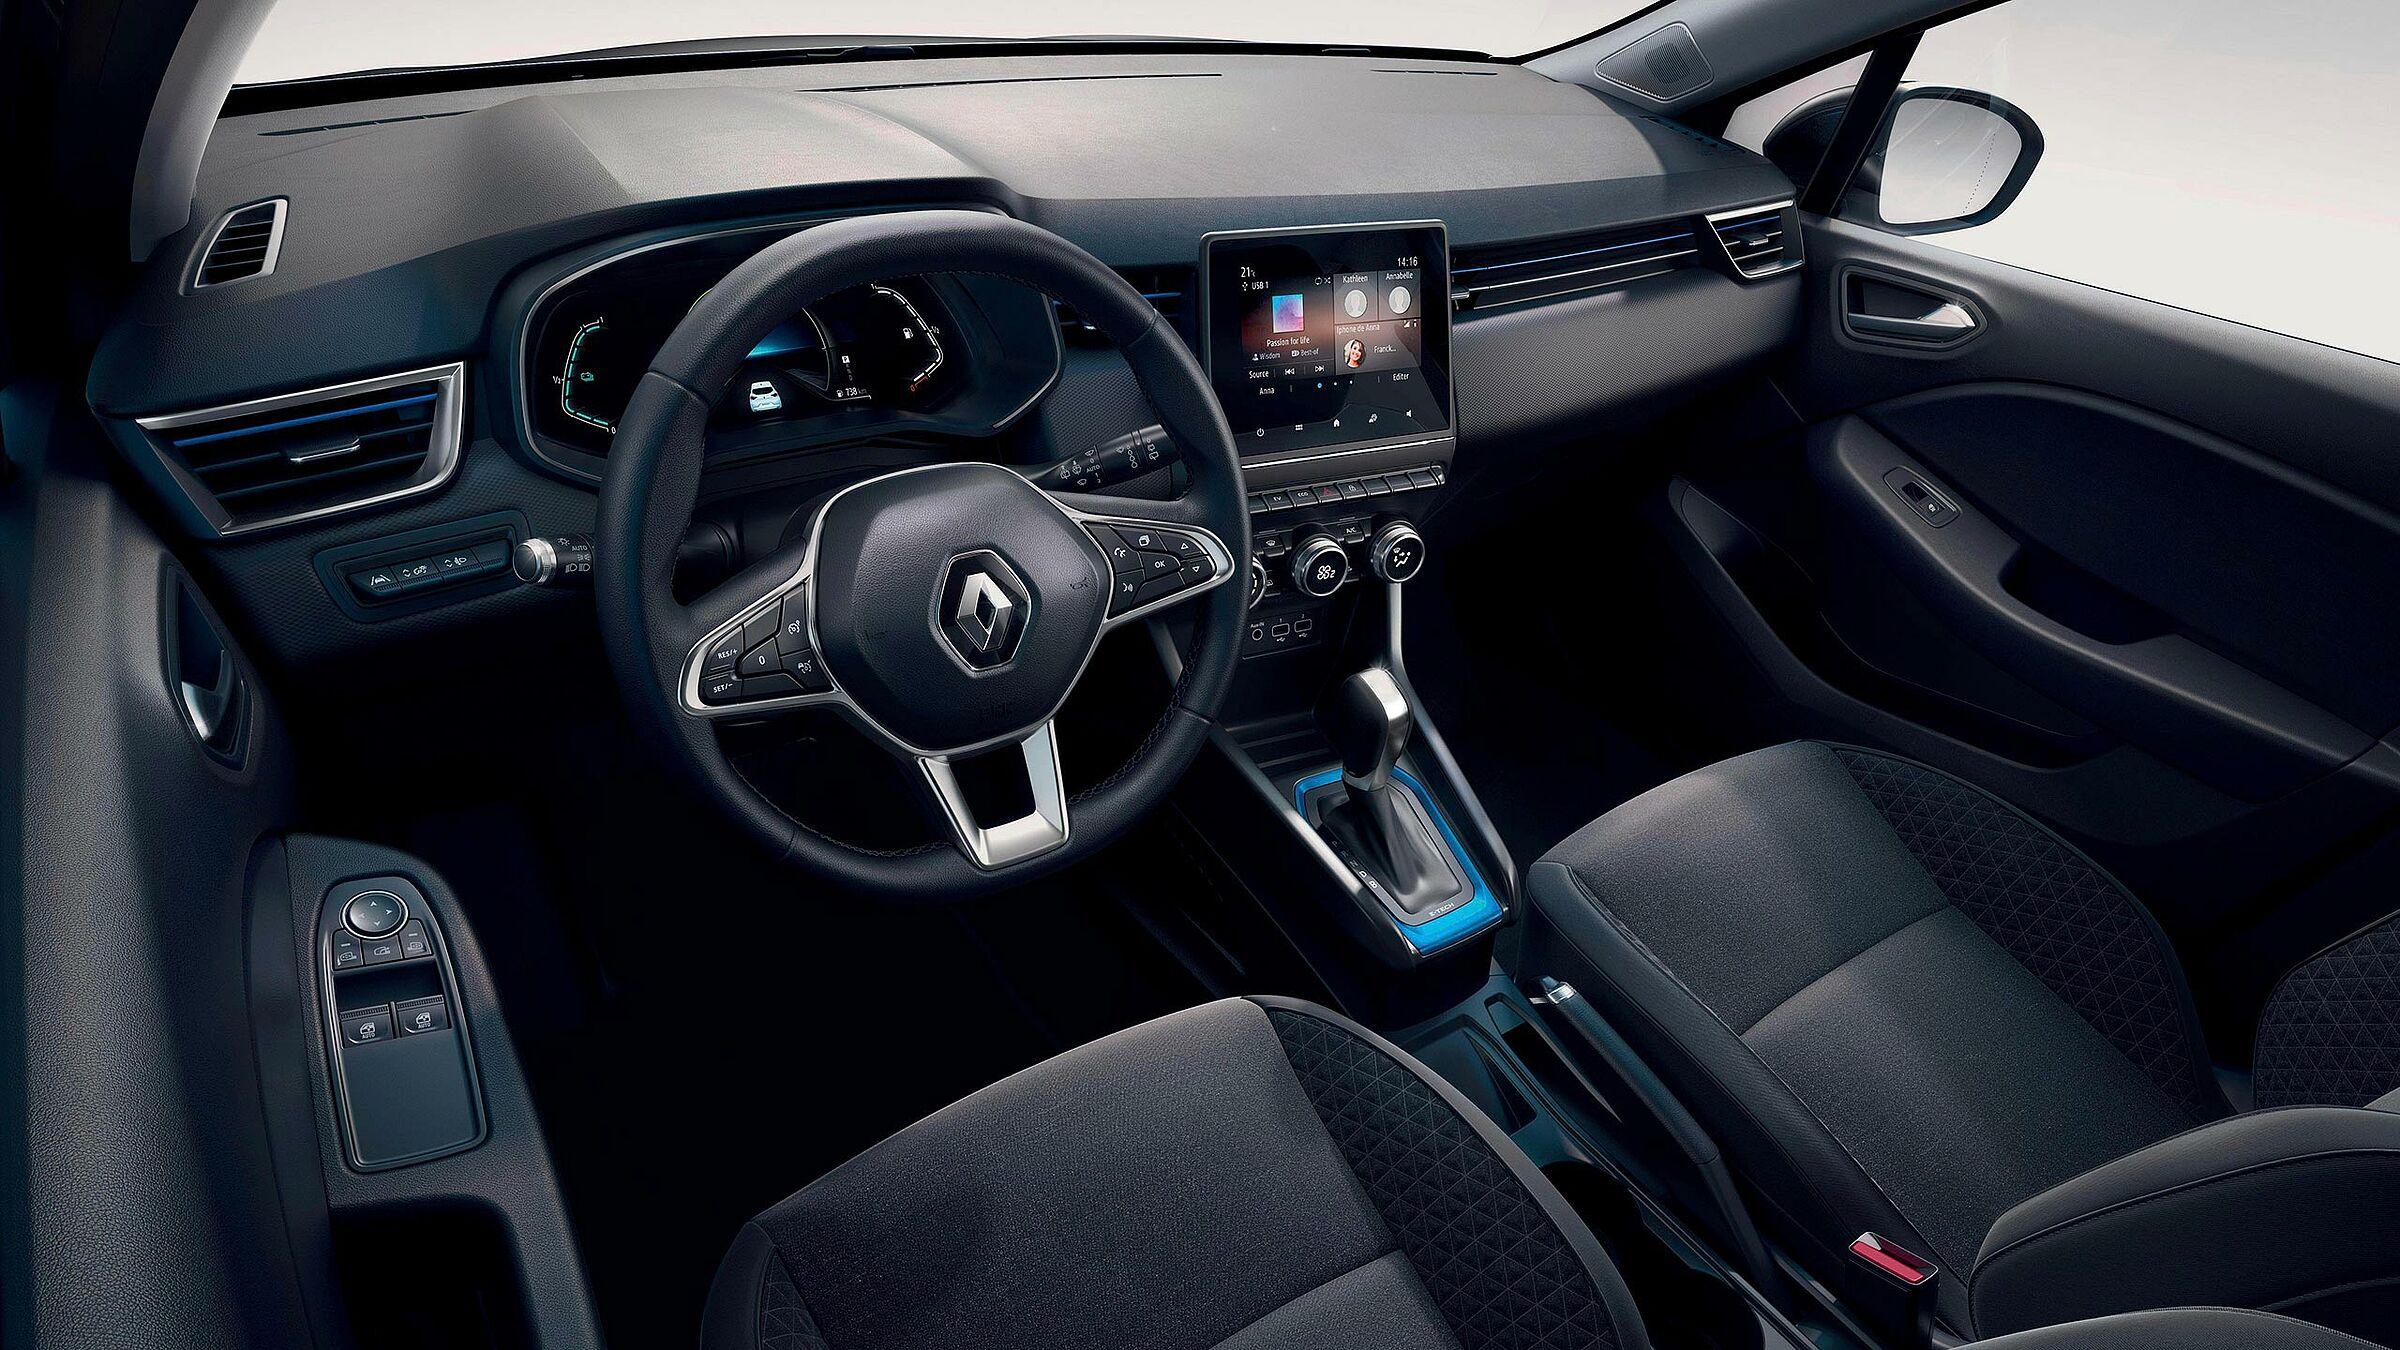 Renault Clio Hybrid Autozentren P&A - Preckel